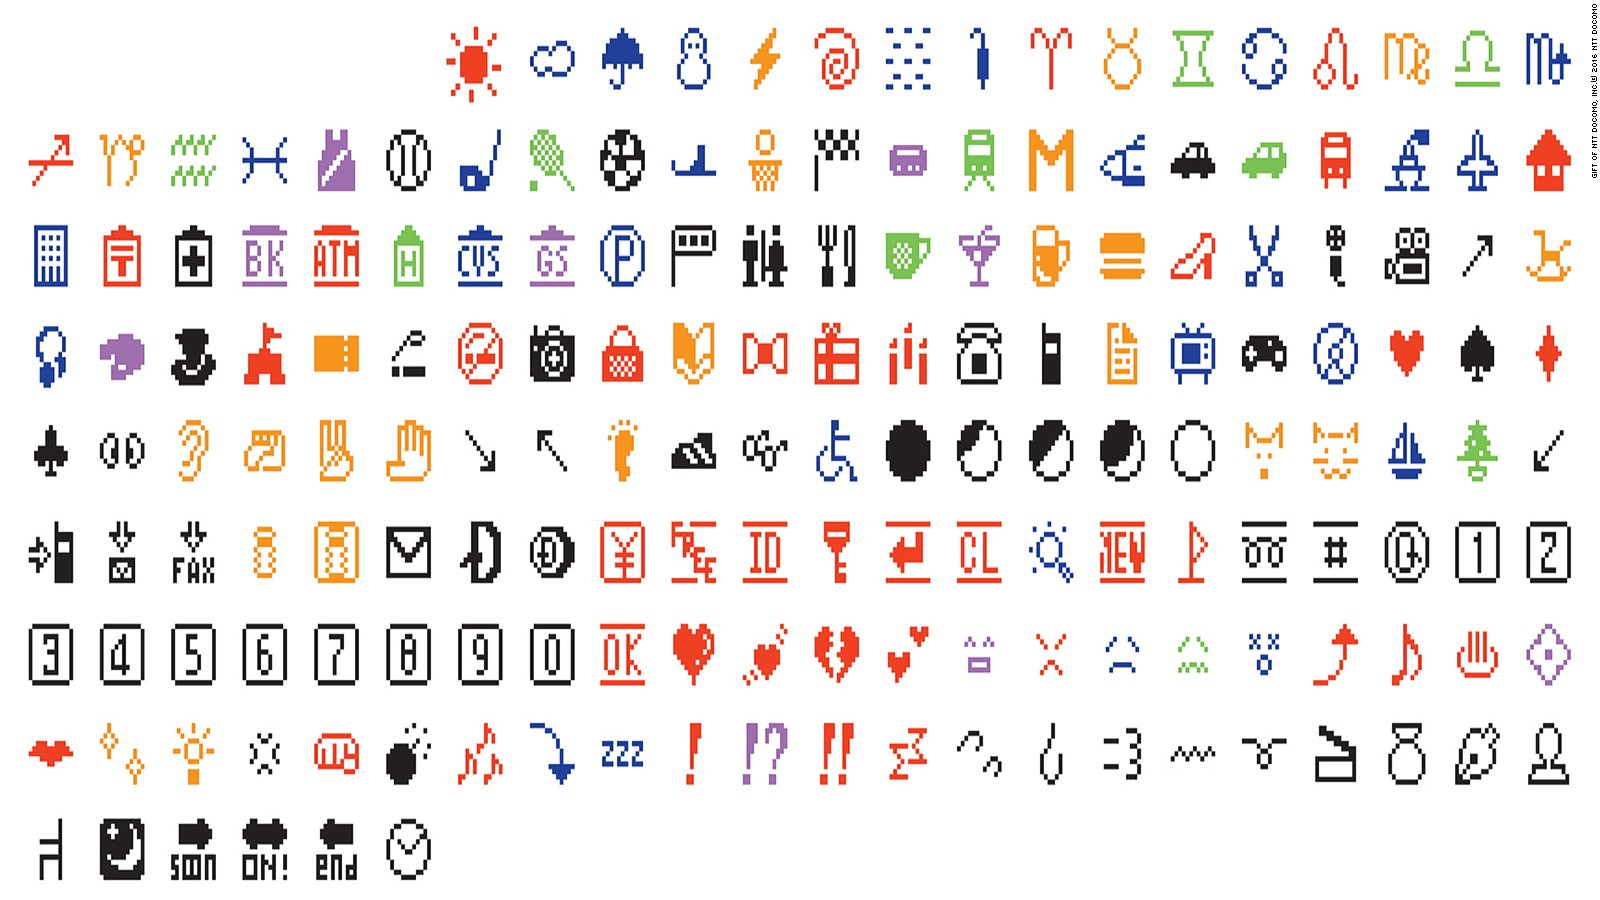 Japanese Emoji Design Expressing Emotions In The Digital Age Cnn